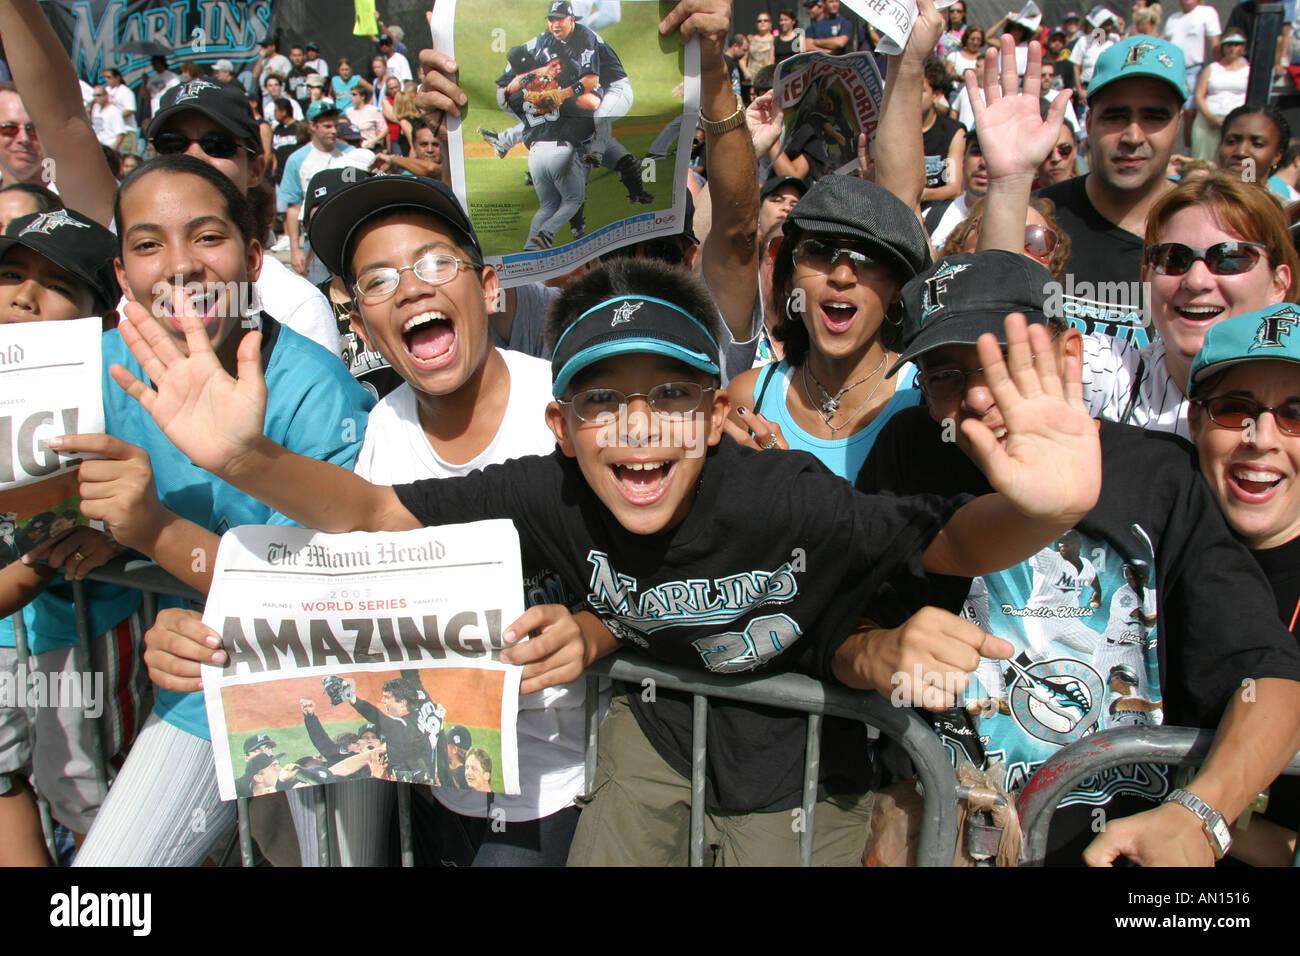 Miami Florida Flagler Street Florida Marlins Major League Baseball World Series winner fans celebrate - Stock Image